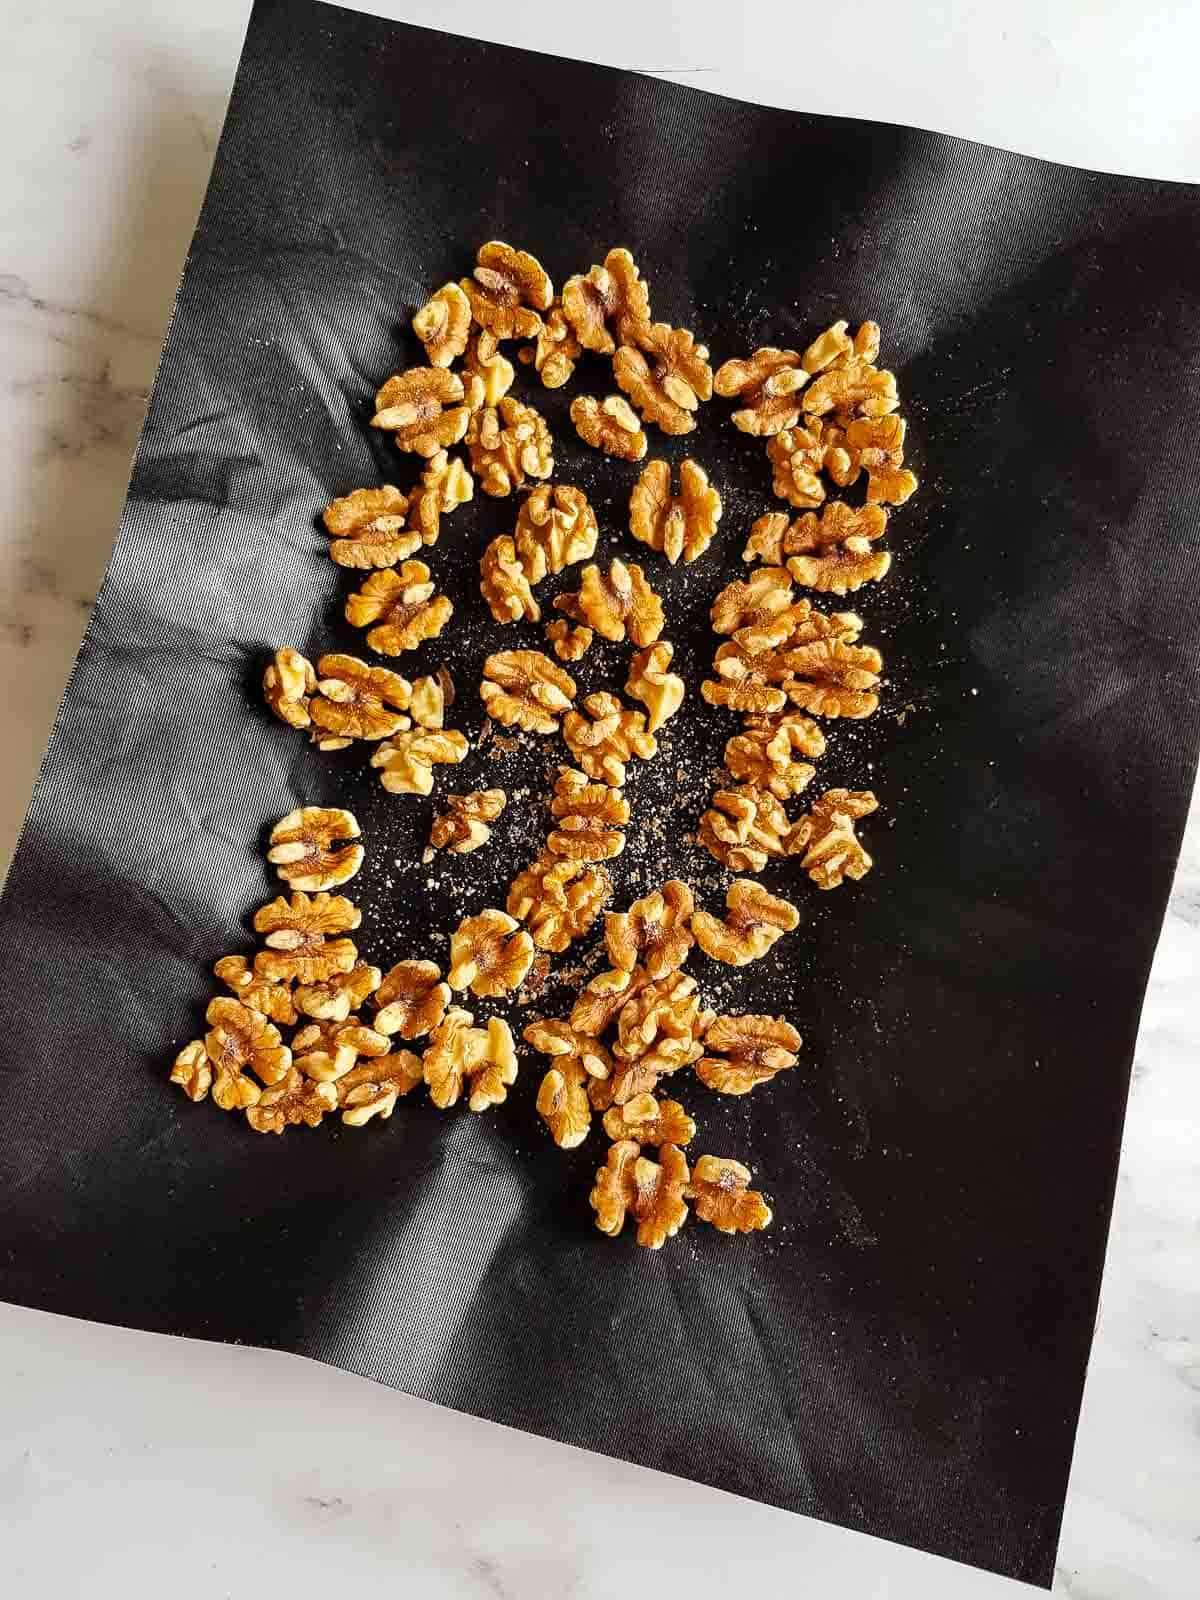 Roasted walnuts on a baking sheet.